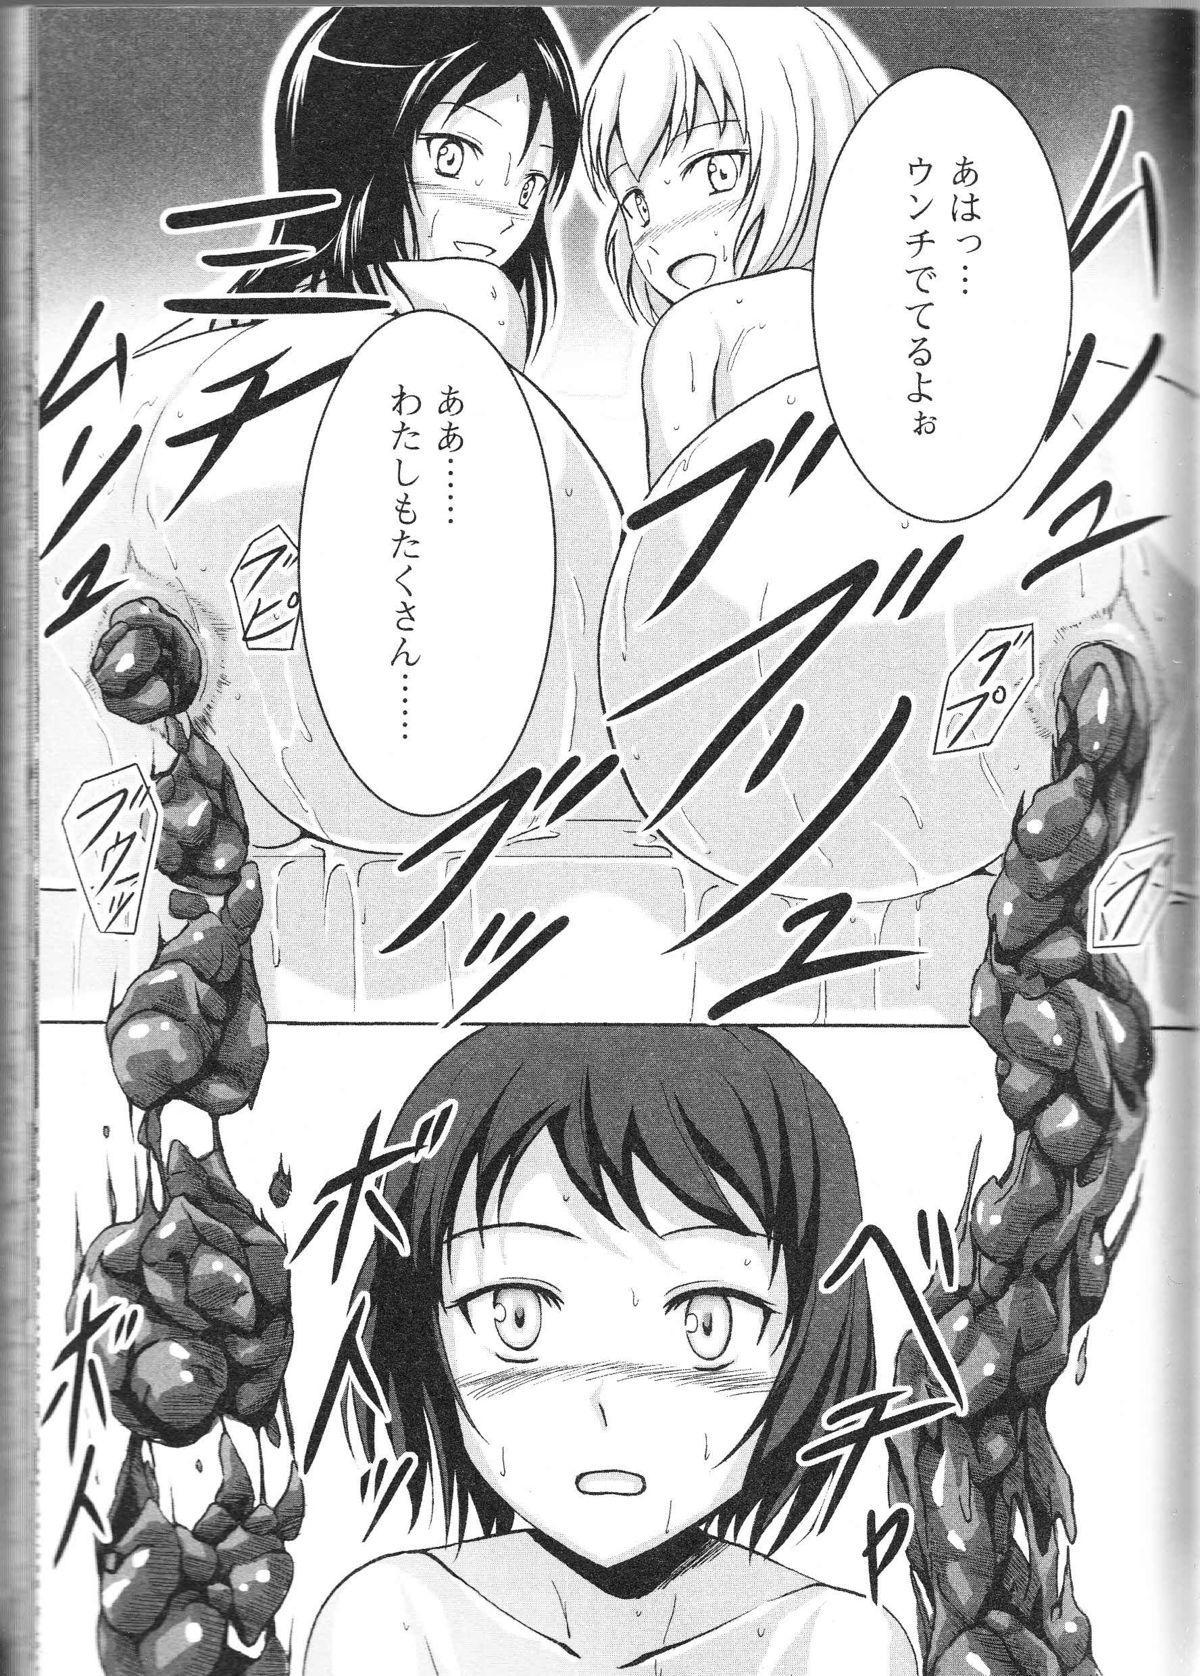 Nozoite wa Ikenai 9 - Do Not Peep! 9 101